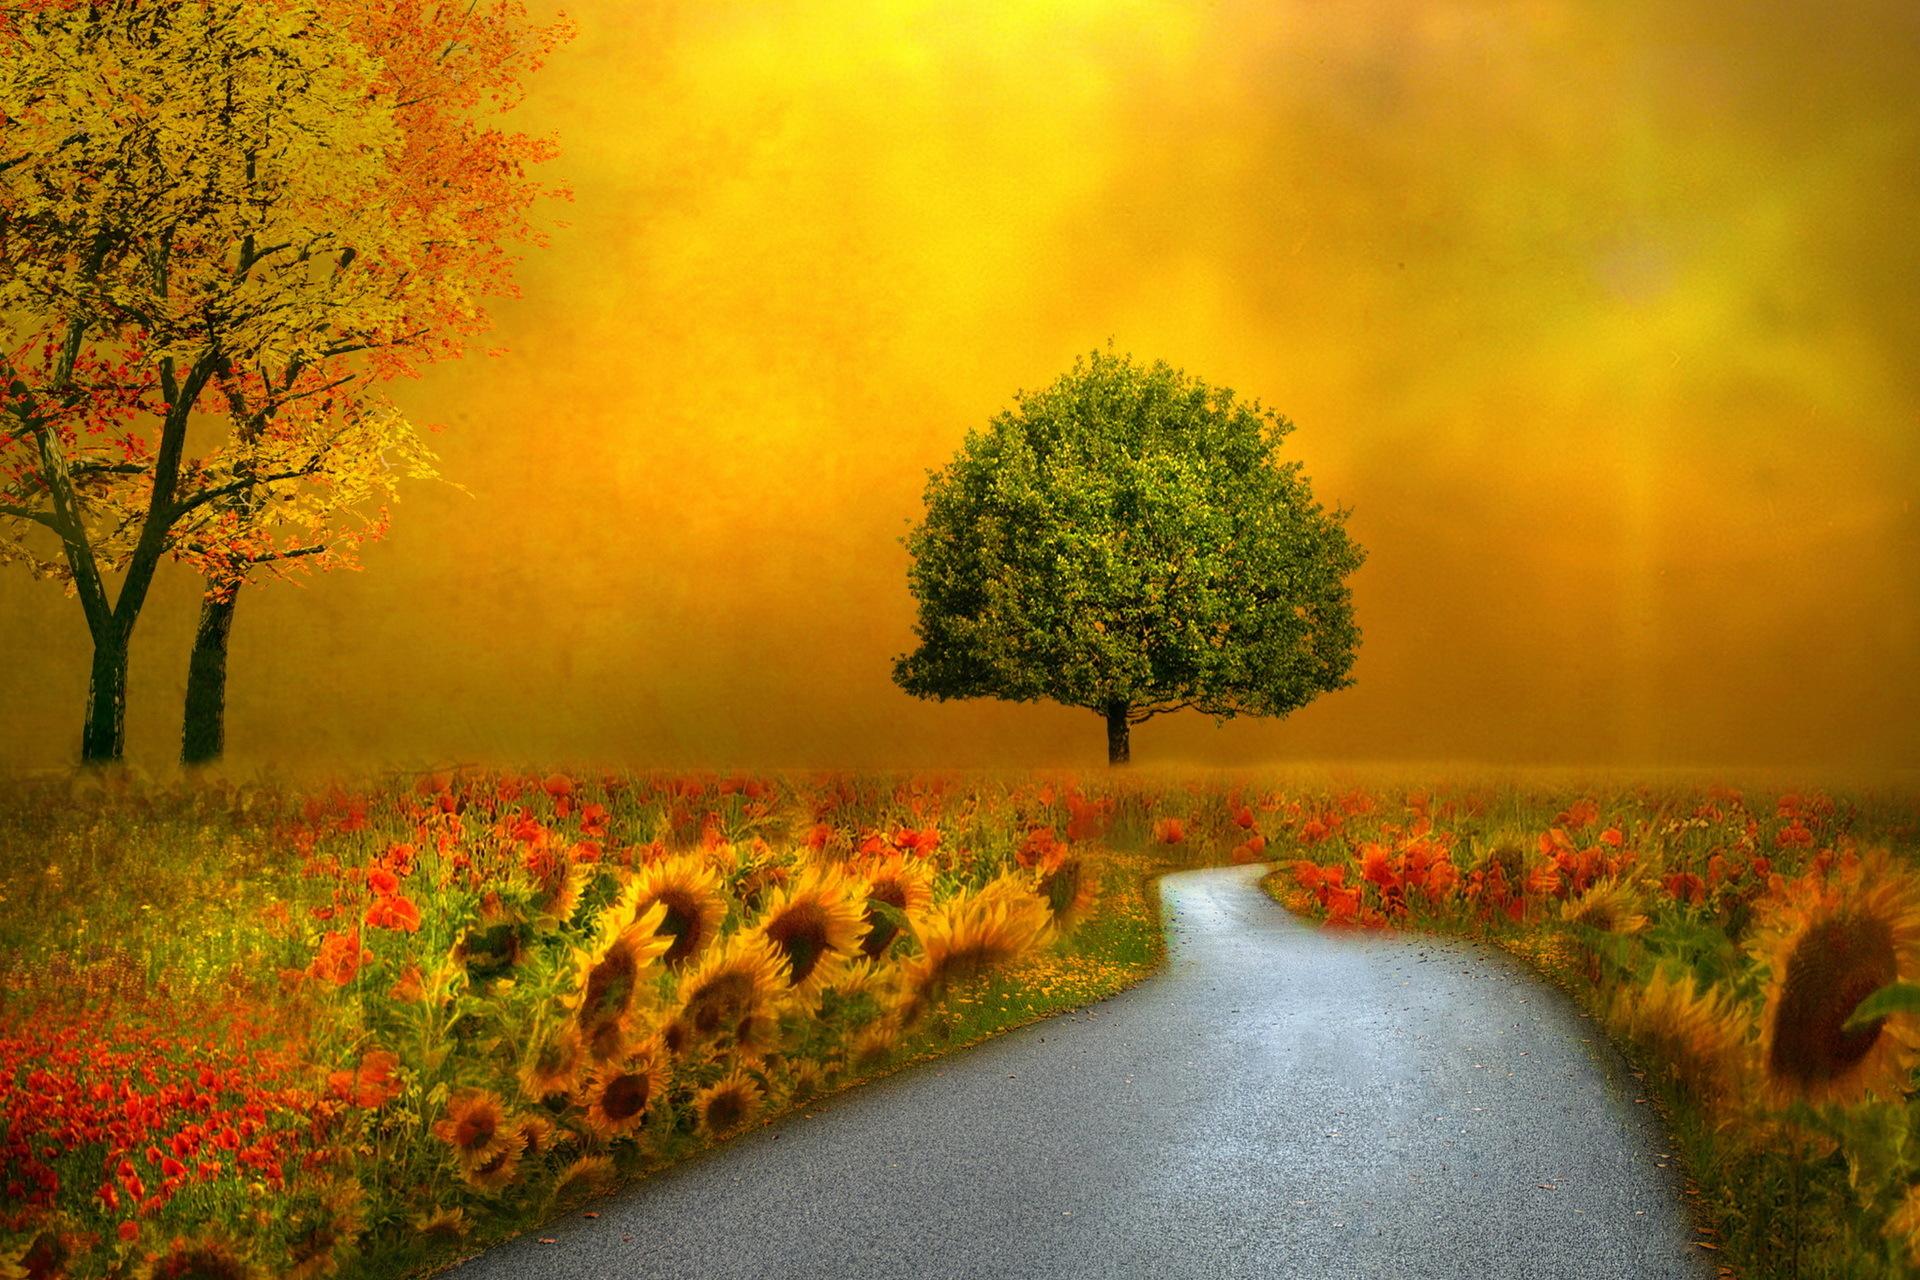 nature autumn fall seasons flowers roads pathways wallpaper background